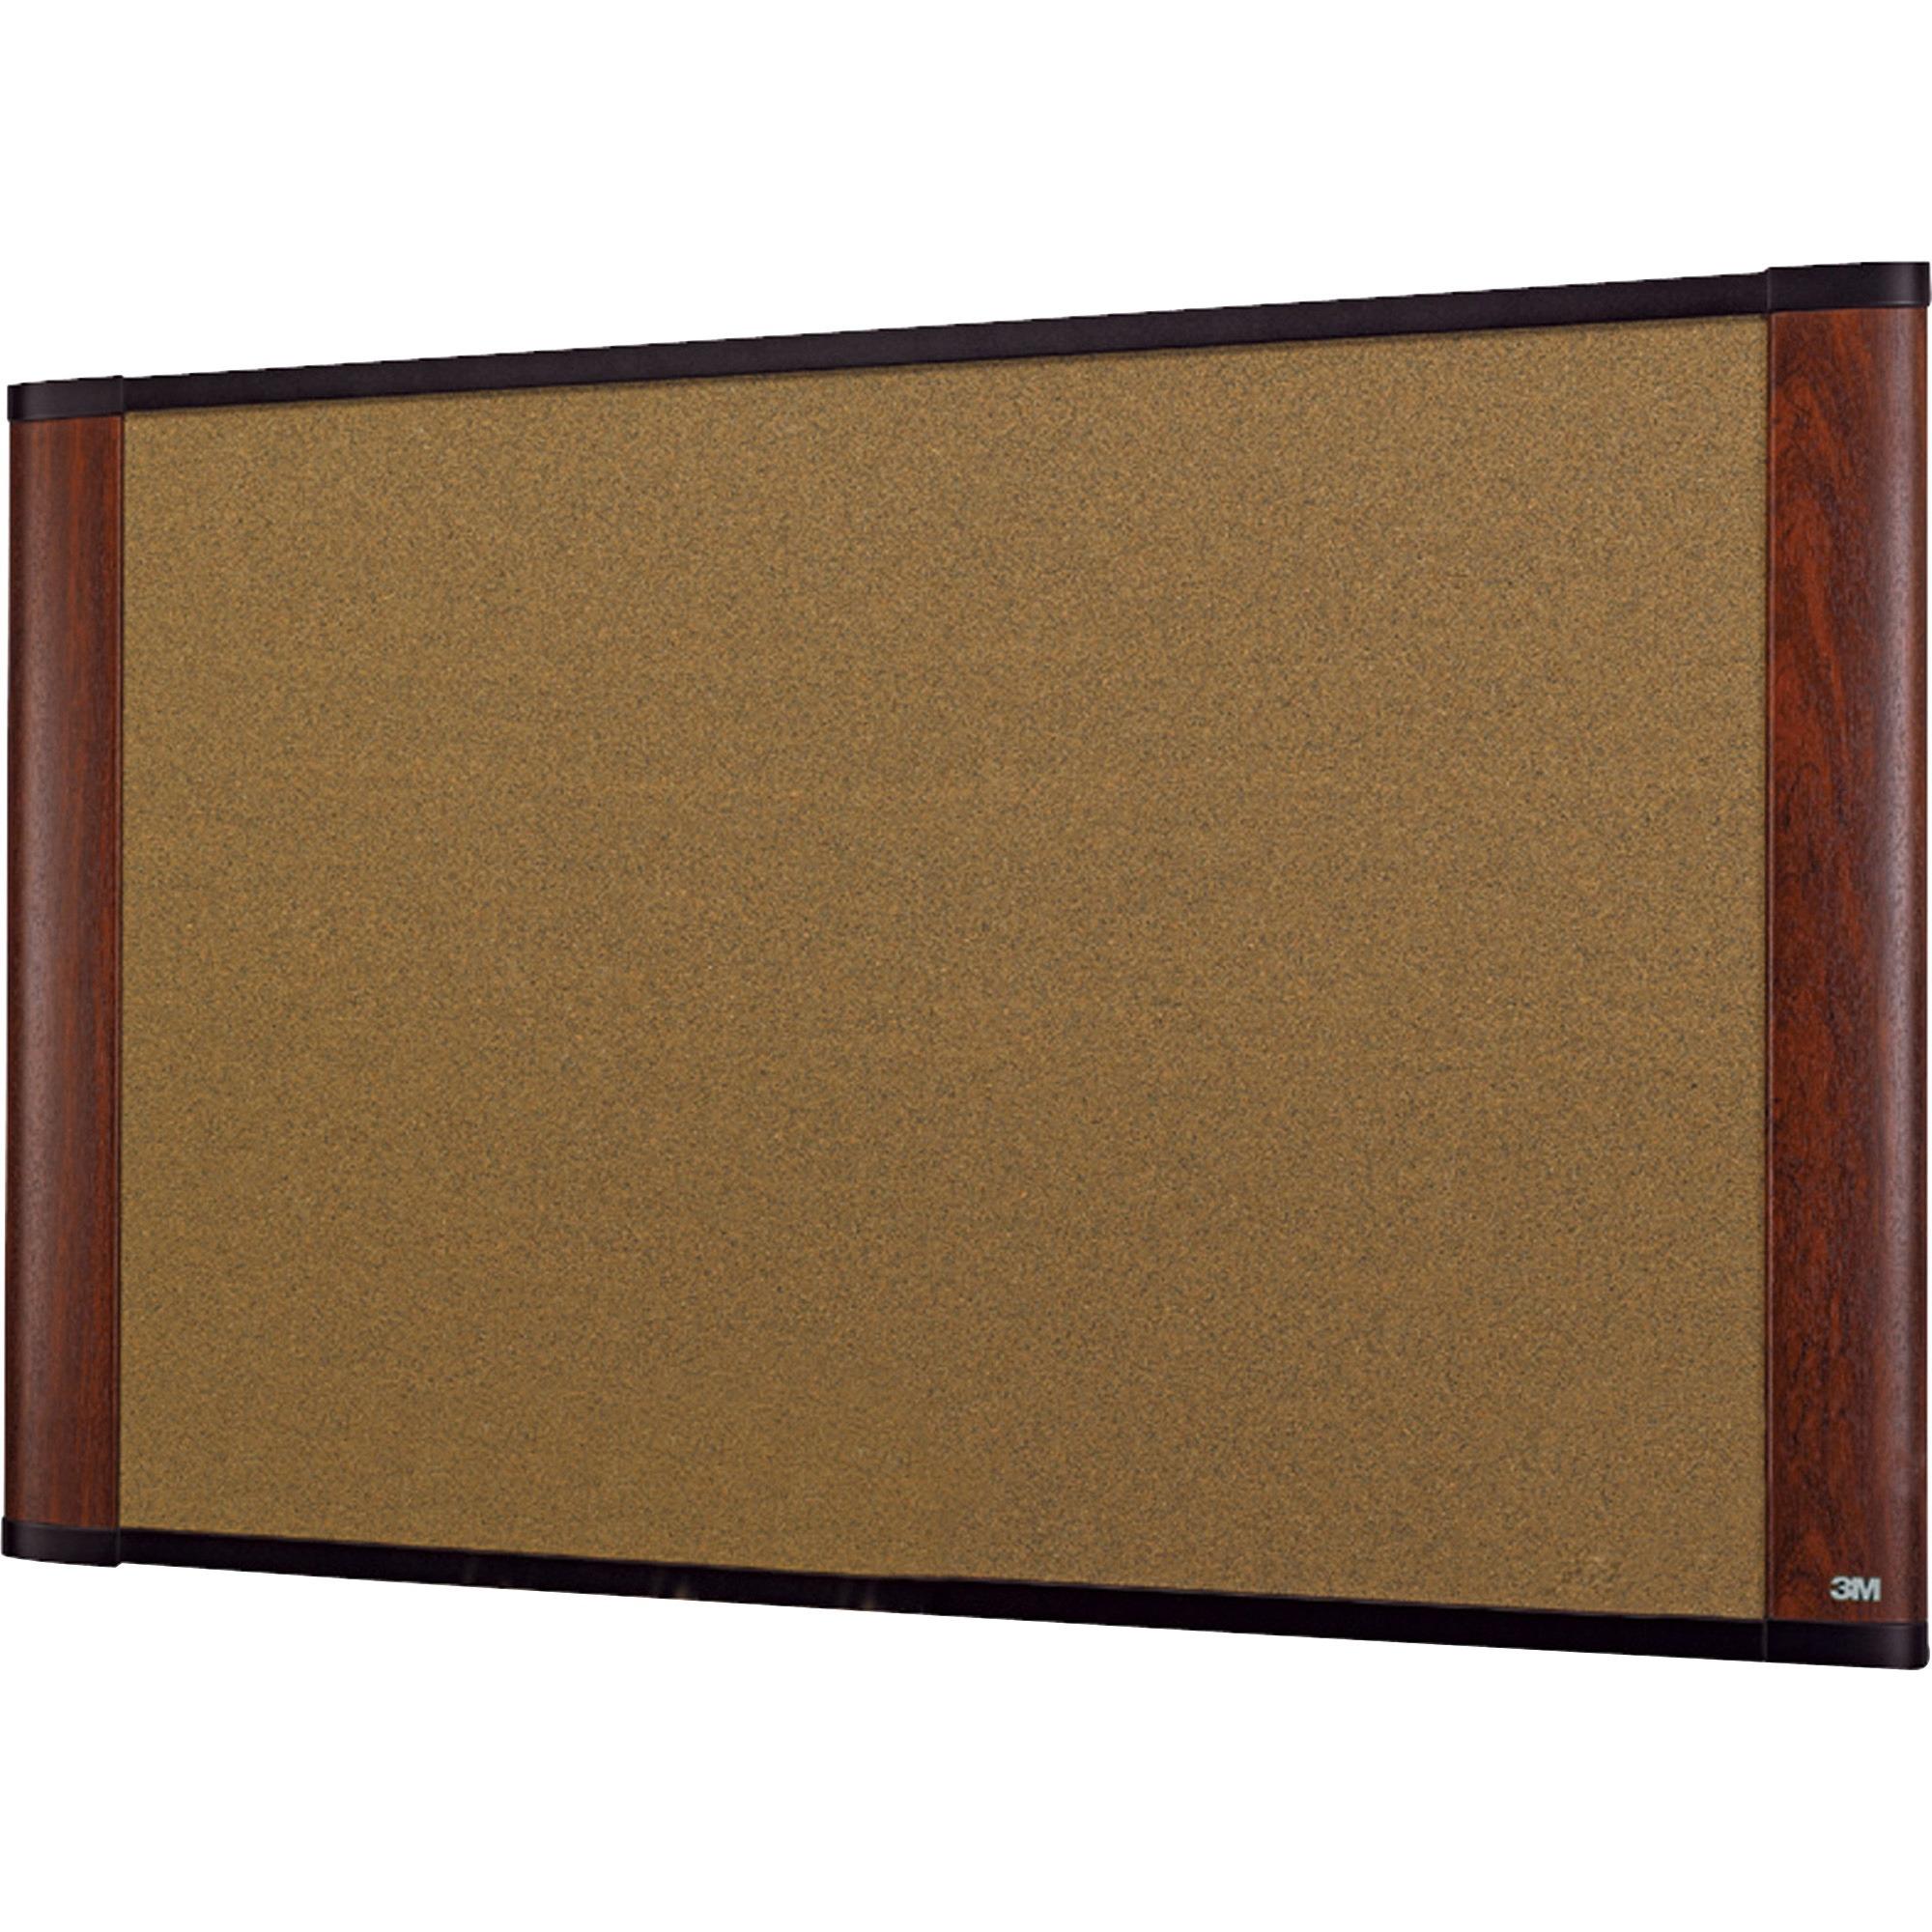 "3M Cork Bulletin Board, 72"" x 48"", Aluminum Frame w/Mahogany Wood-Grained Finish"